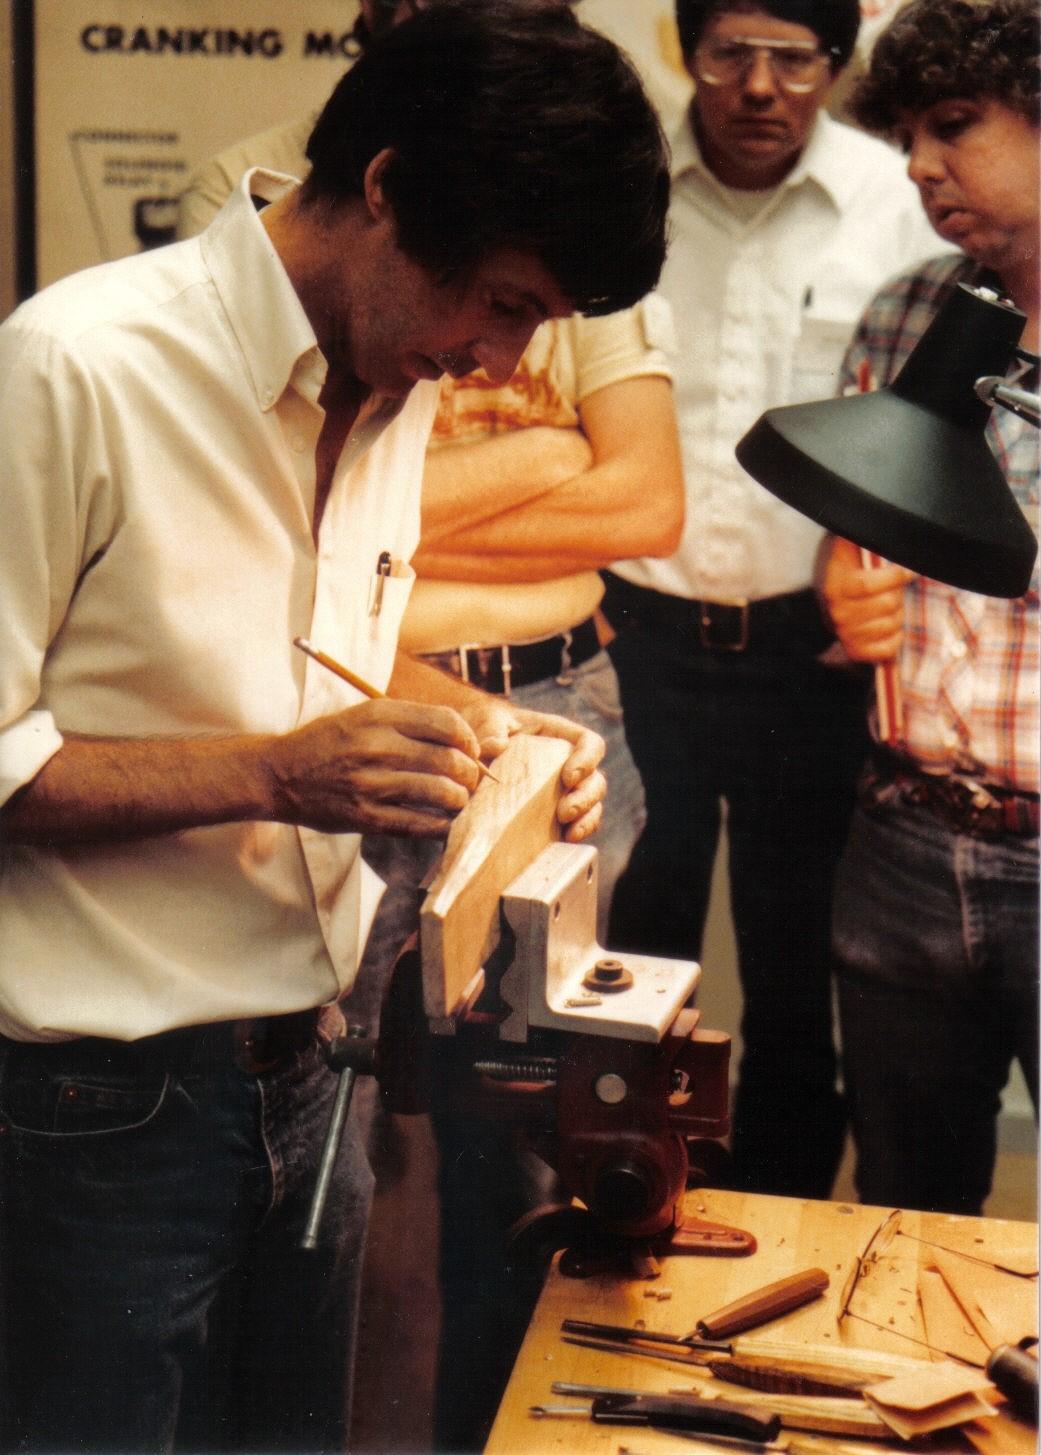 John Bivens Drawing on wood